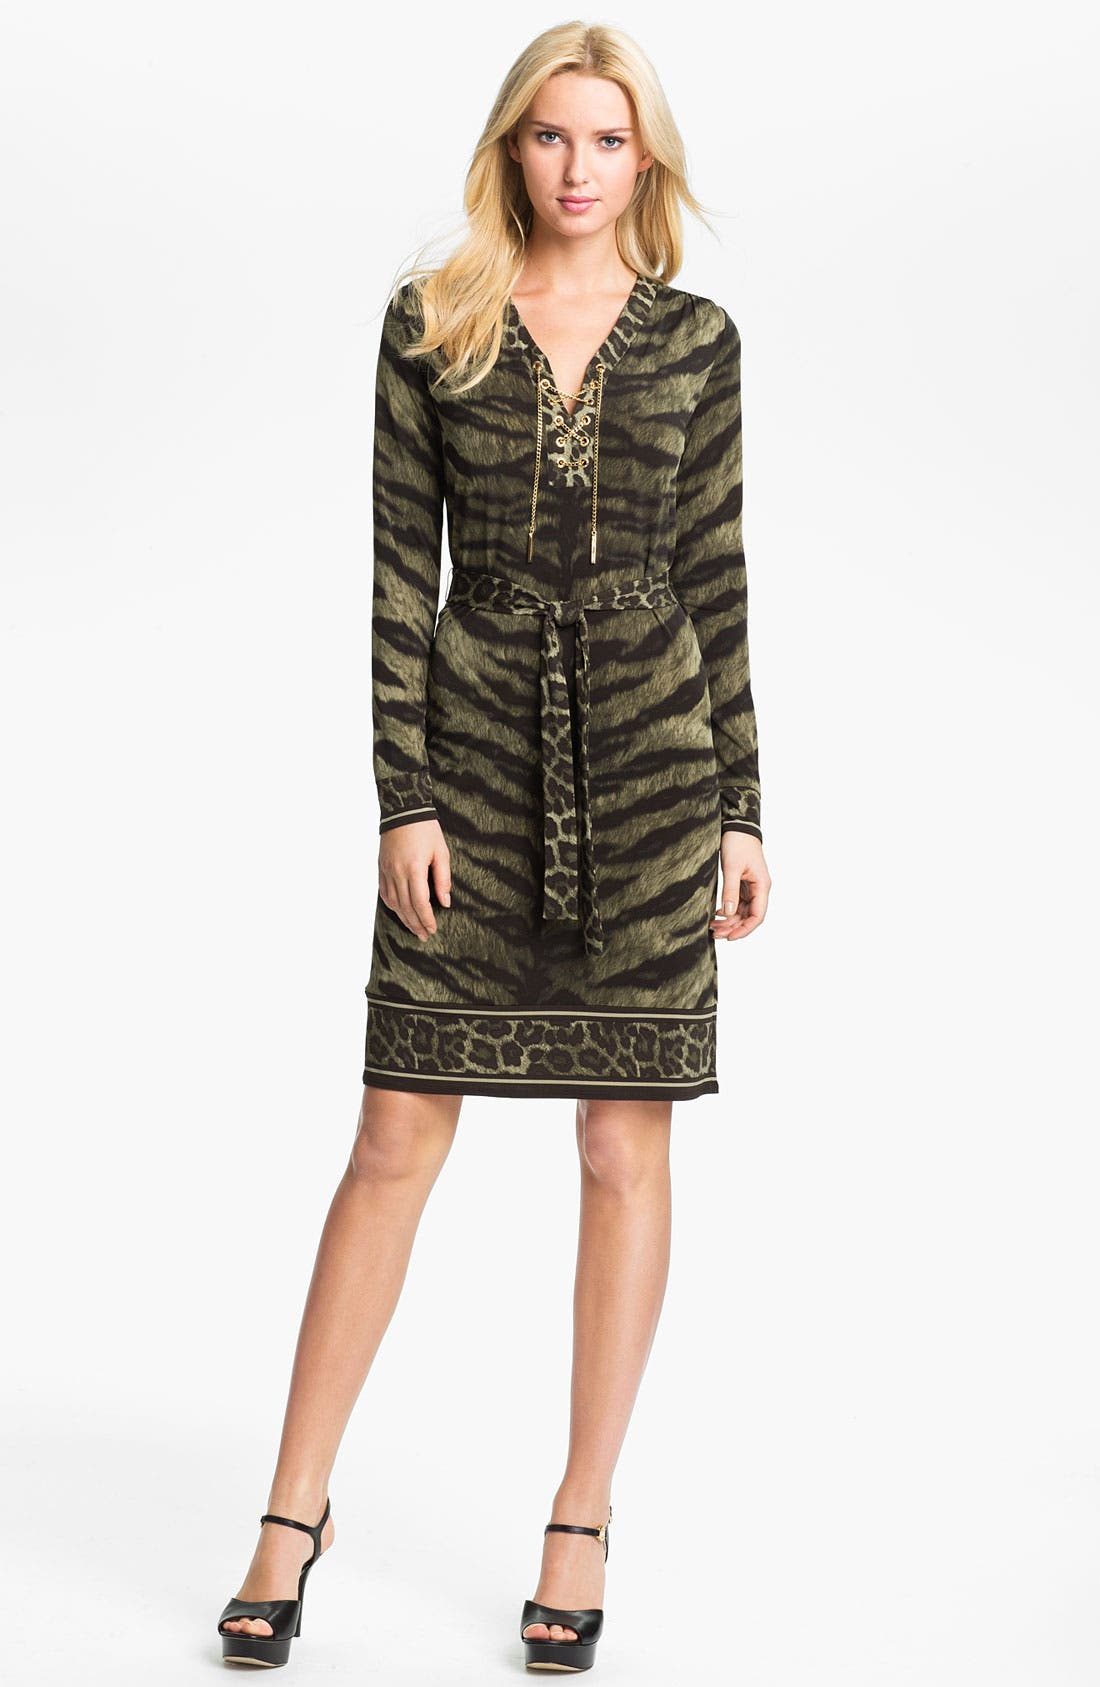 Main Image - MICHAEL Michael Kors Print Lace Up Dress